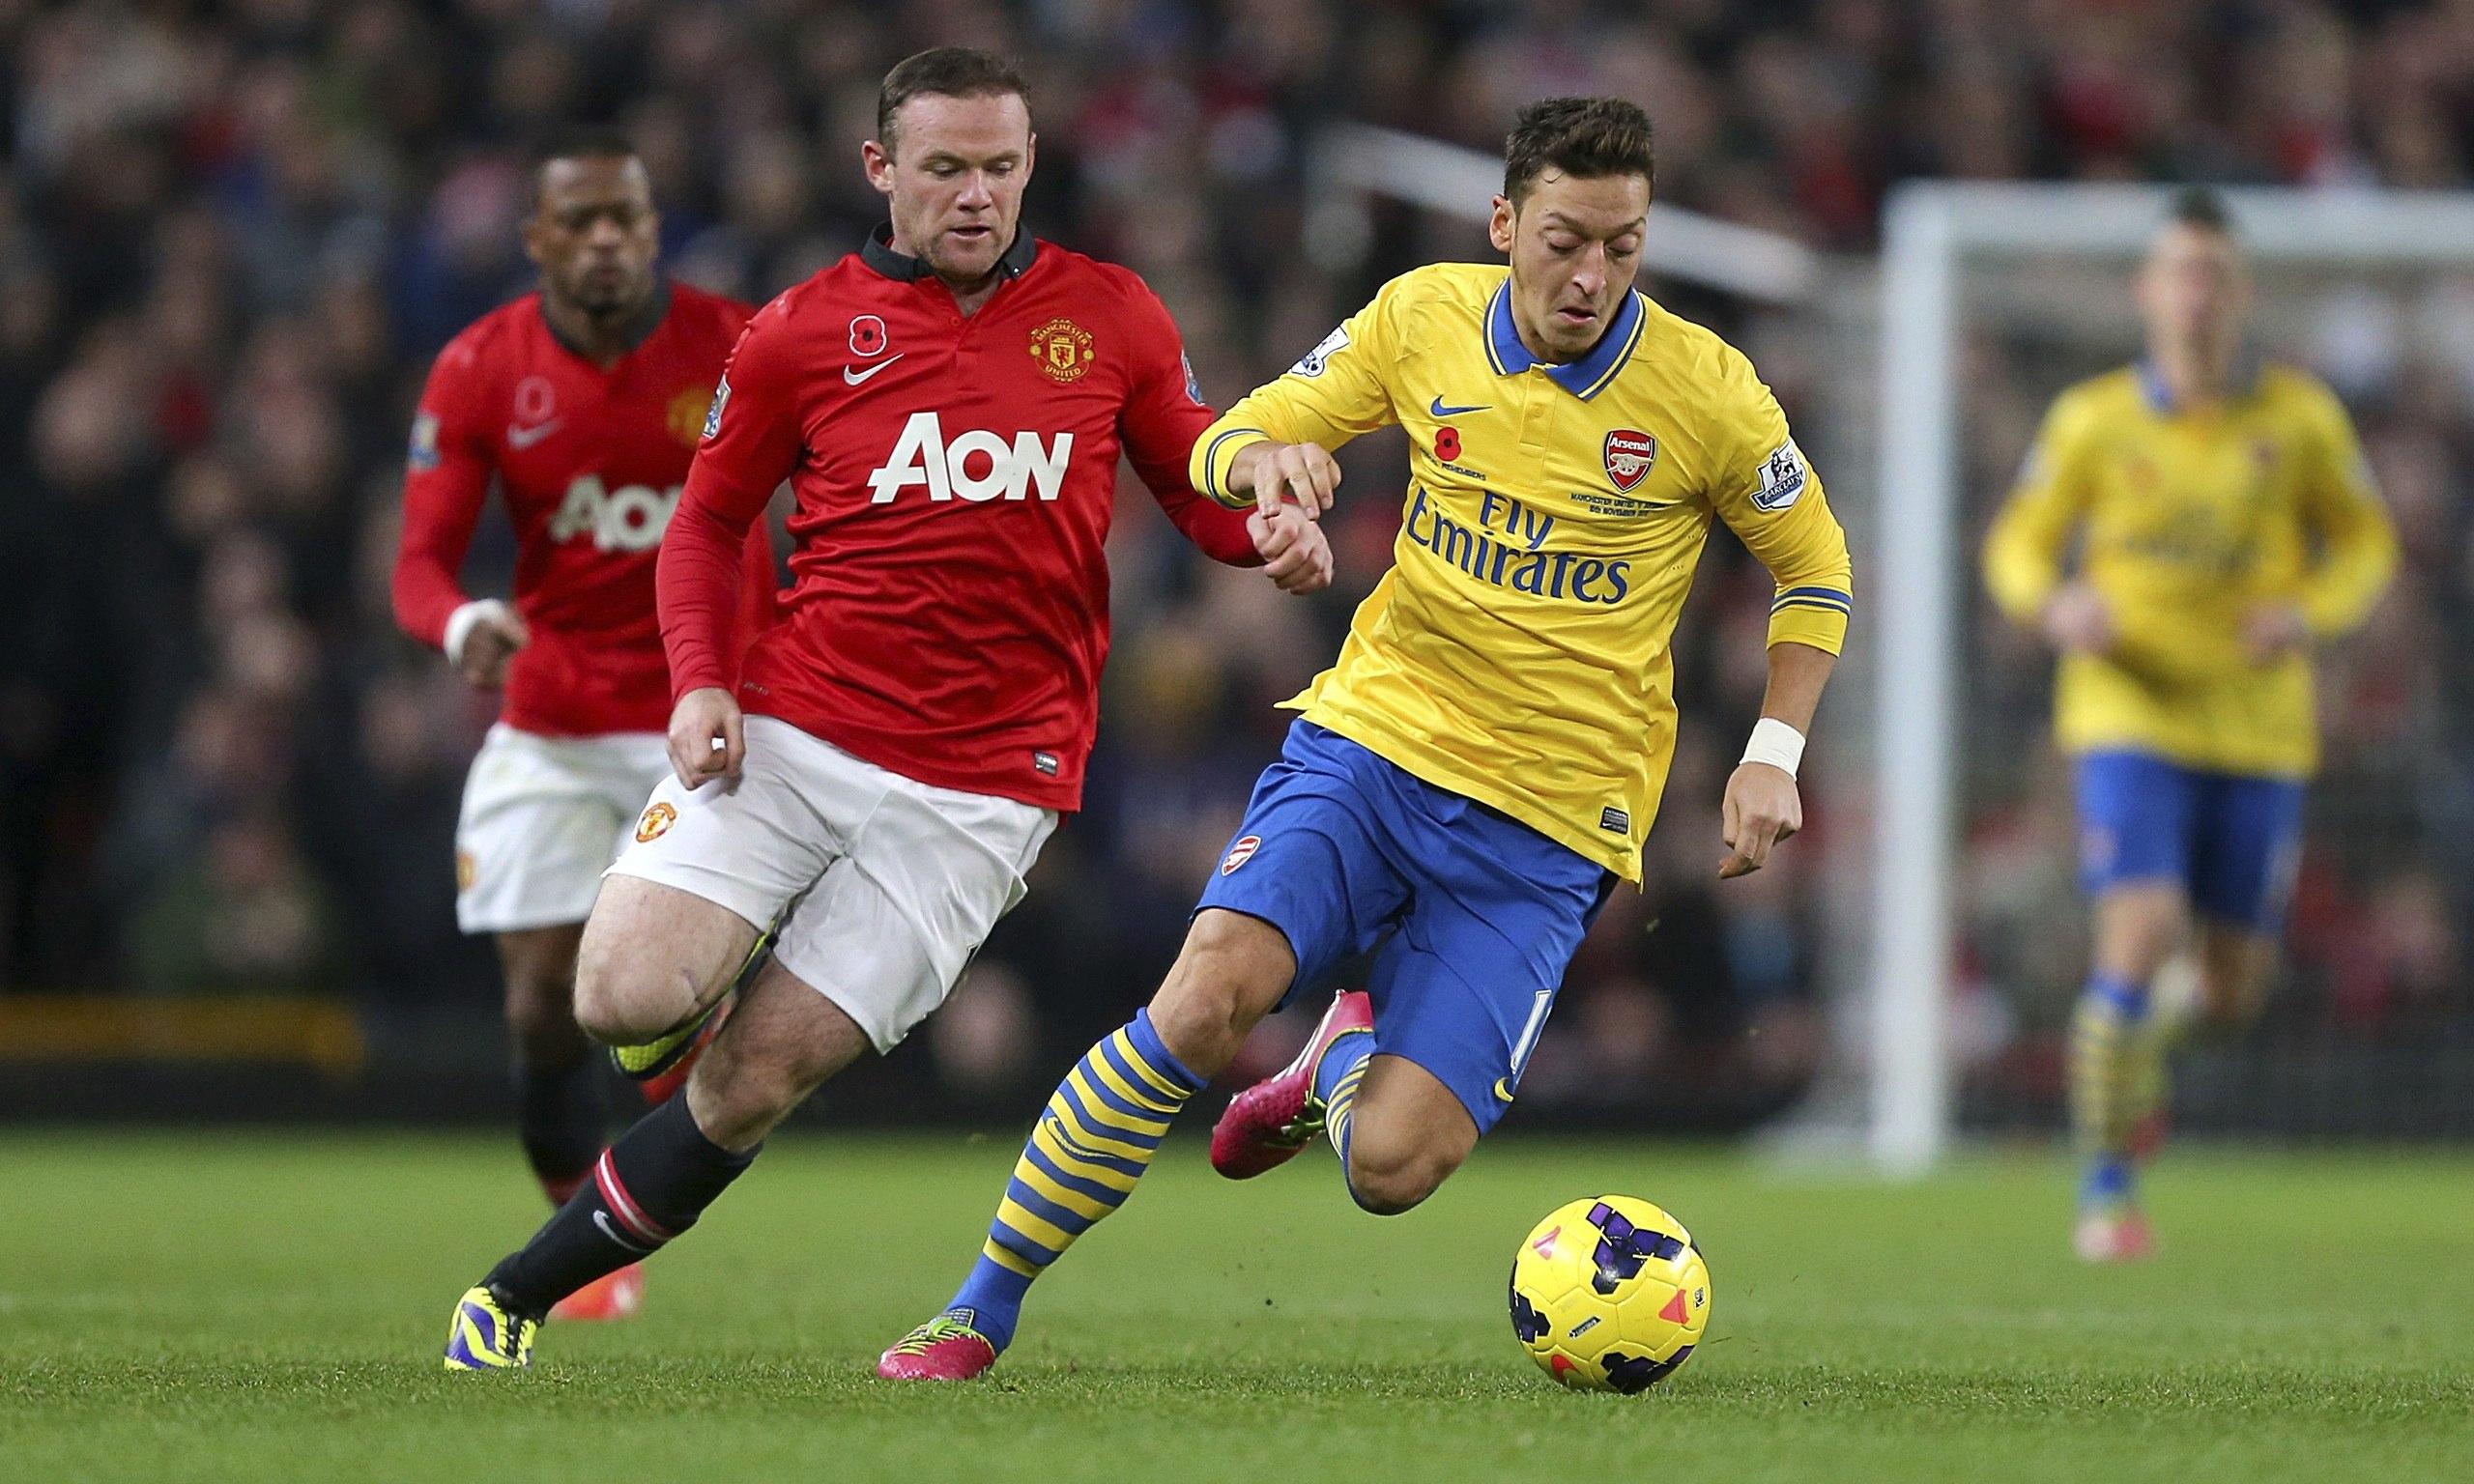 Manchester United - Arsenal Live Stream